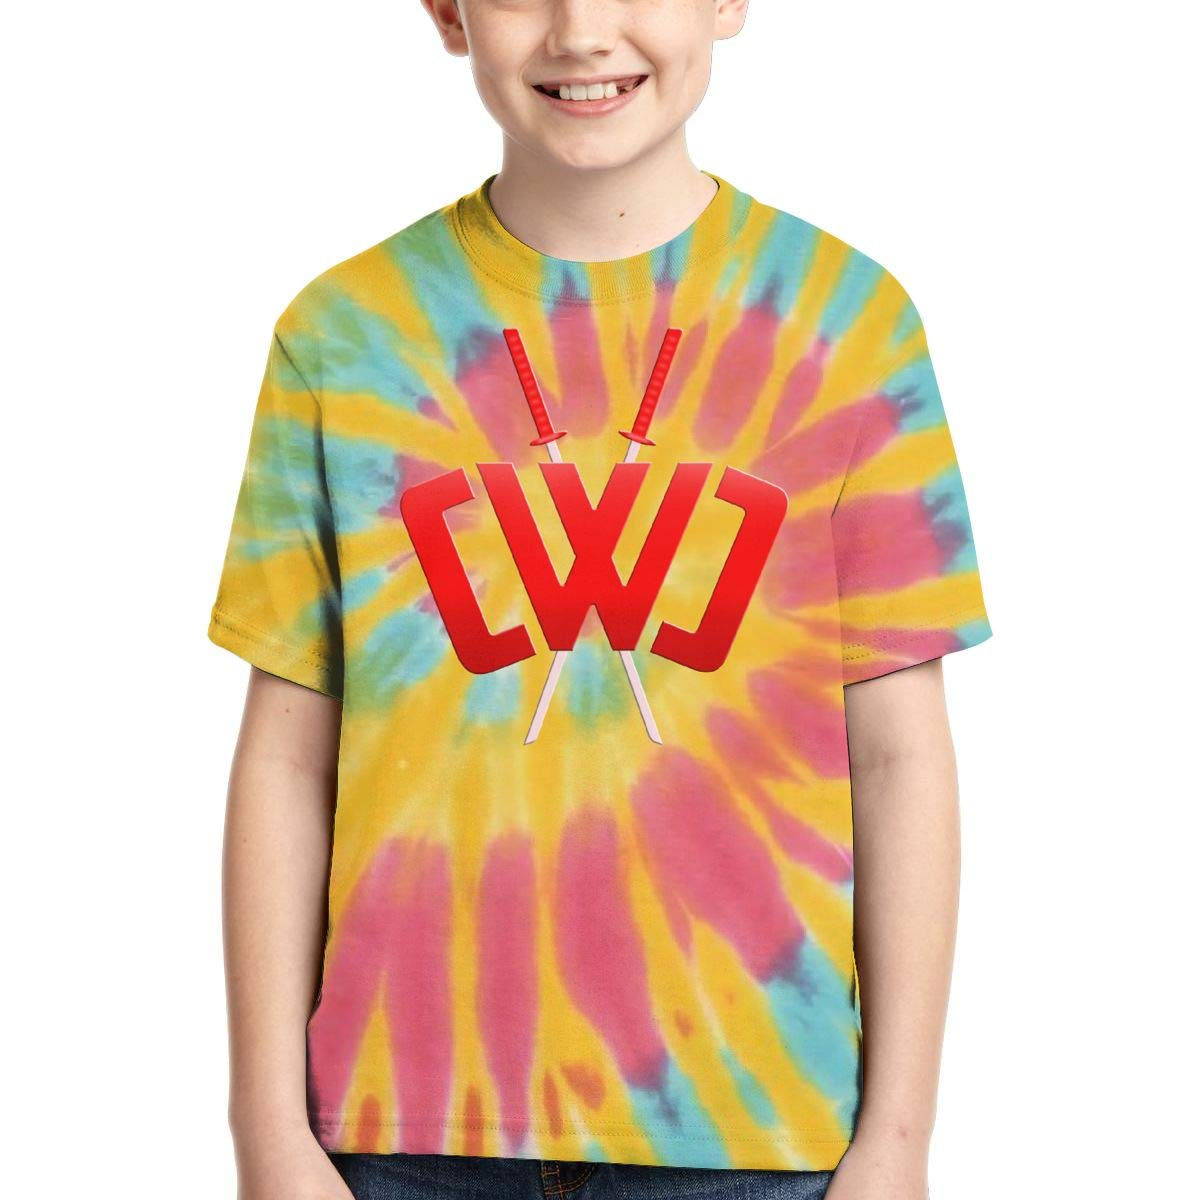 ArthurBarros Preston-Playz Boys and Girls Print T-Shirts